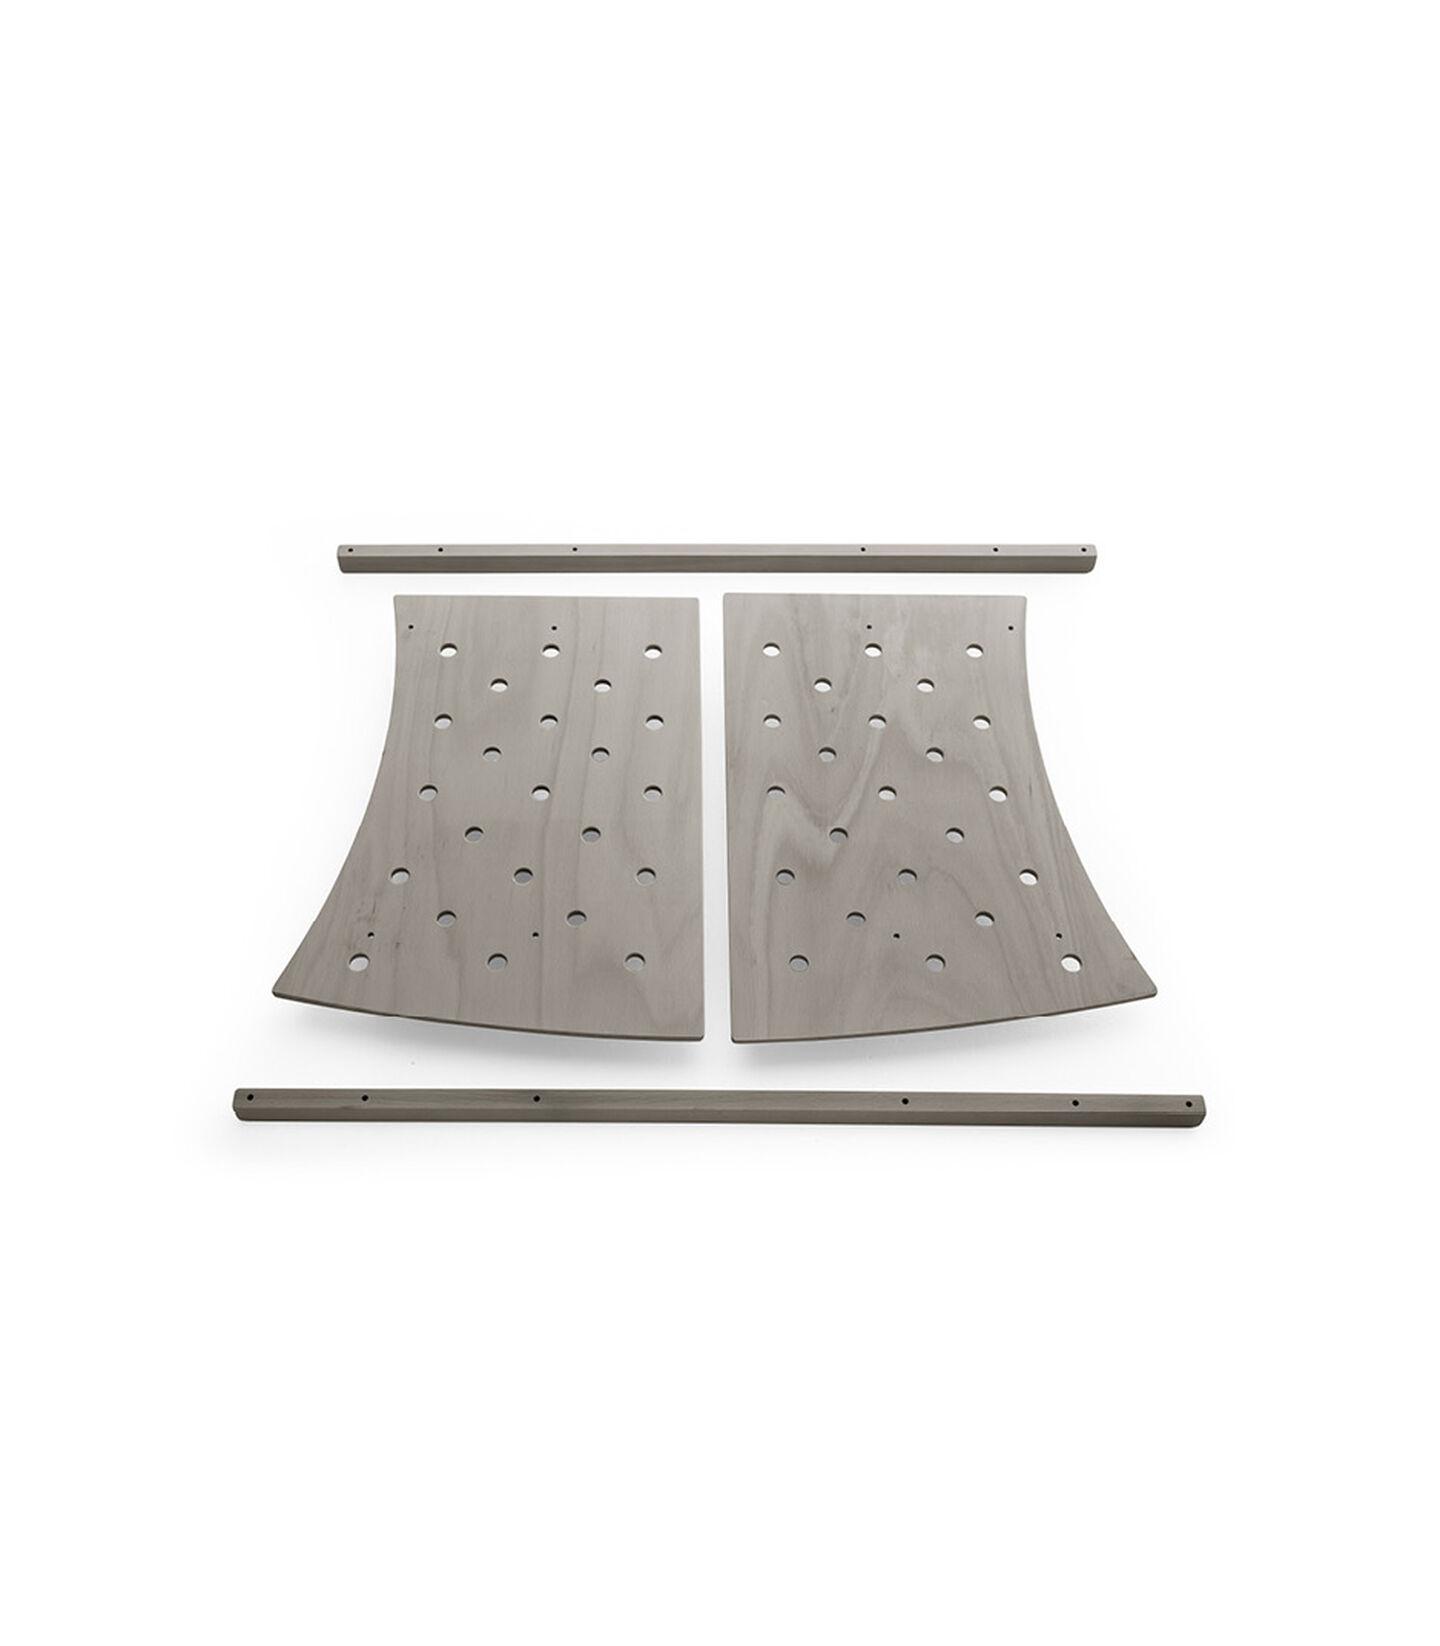 Stokke® Sleepi™ Junior Extension Hazy Grey, Hazy Grey, mainview view 2